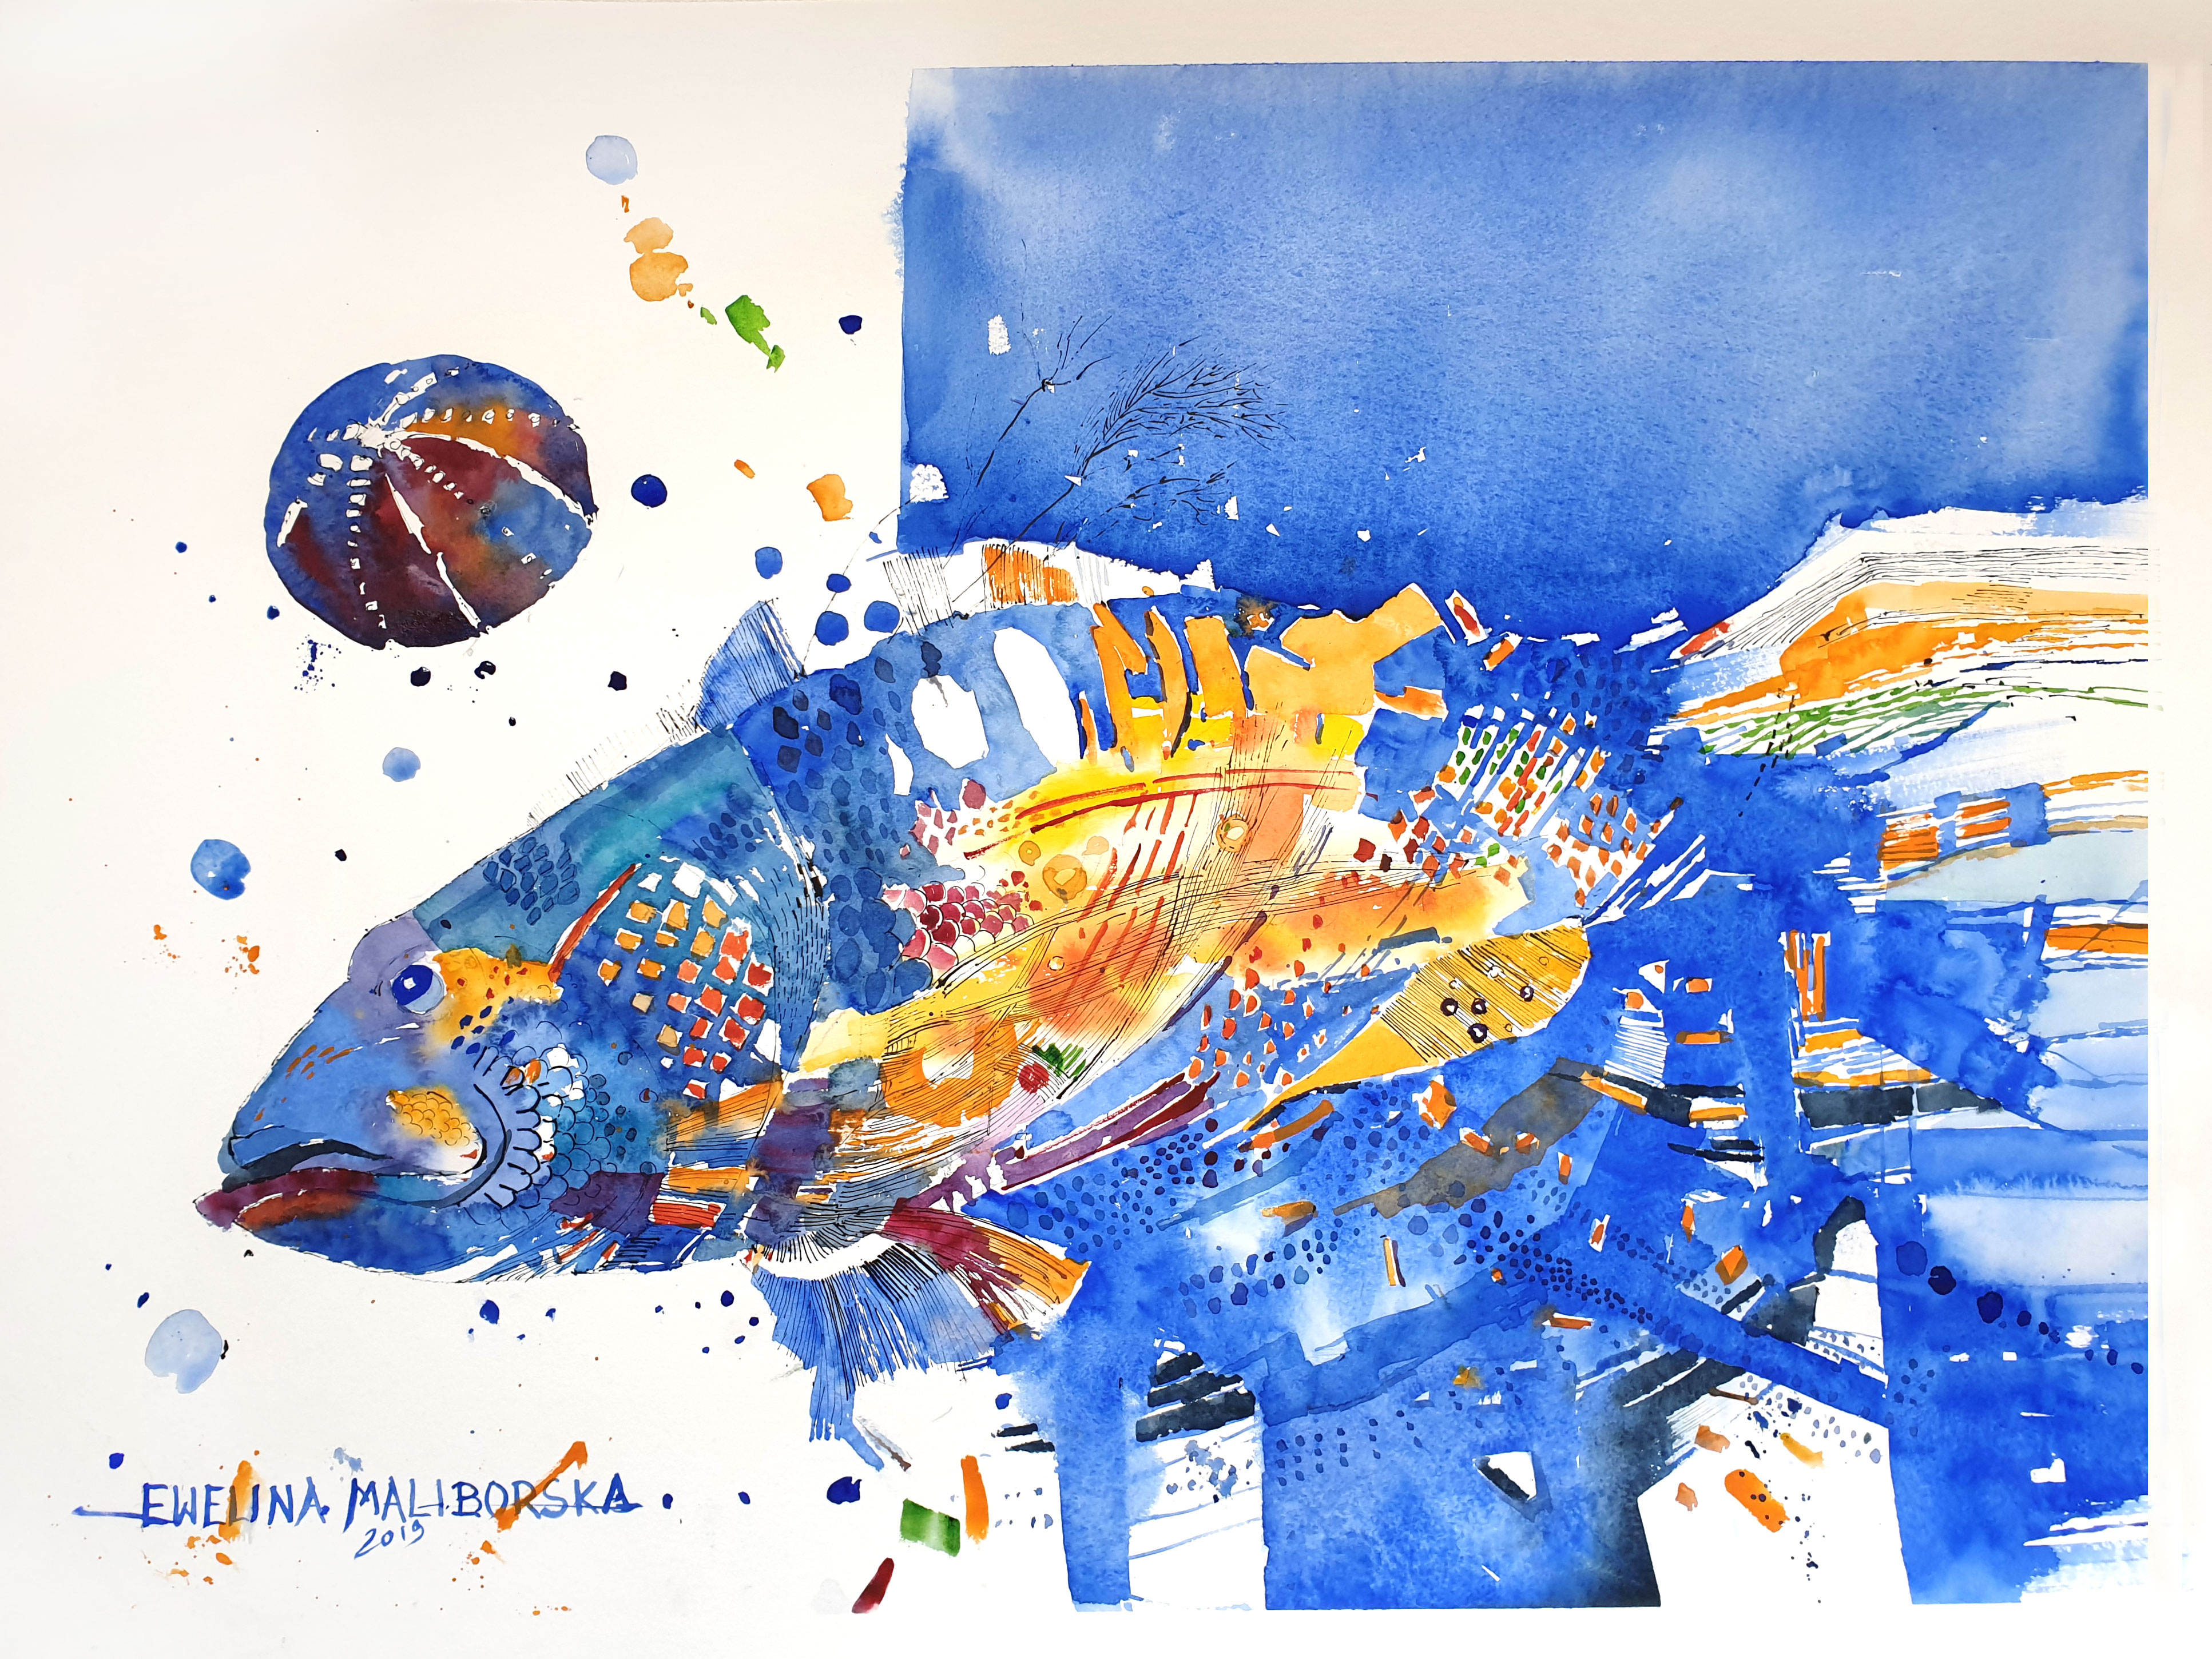 Bul fish,